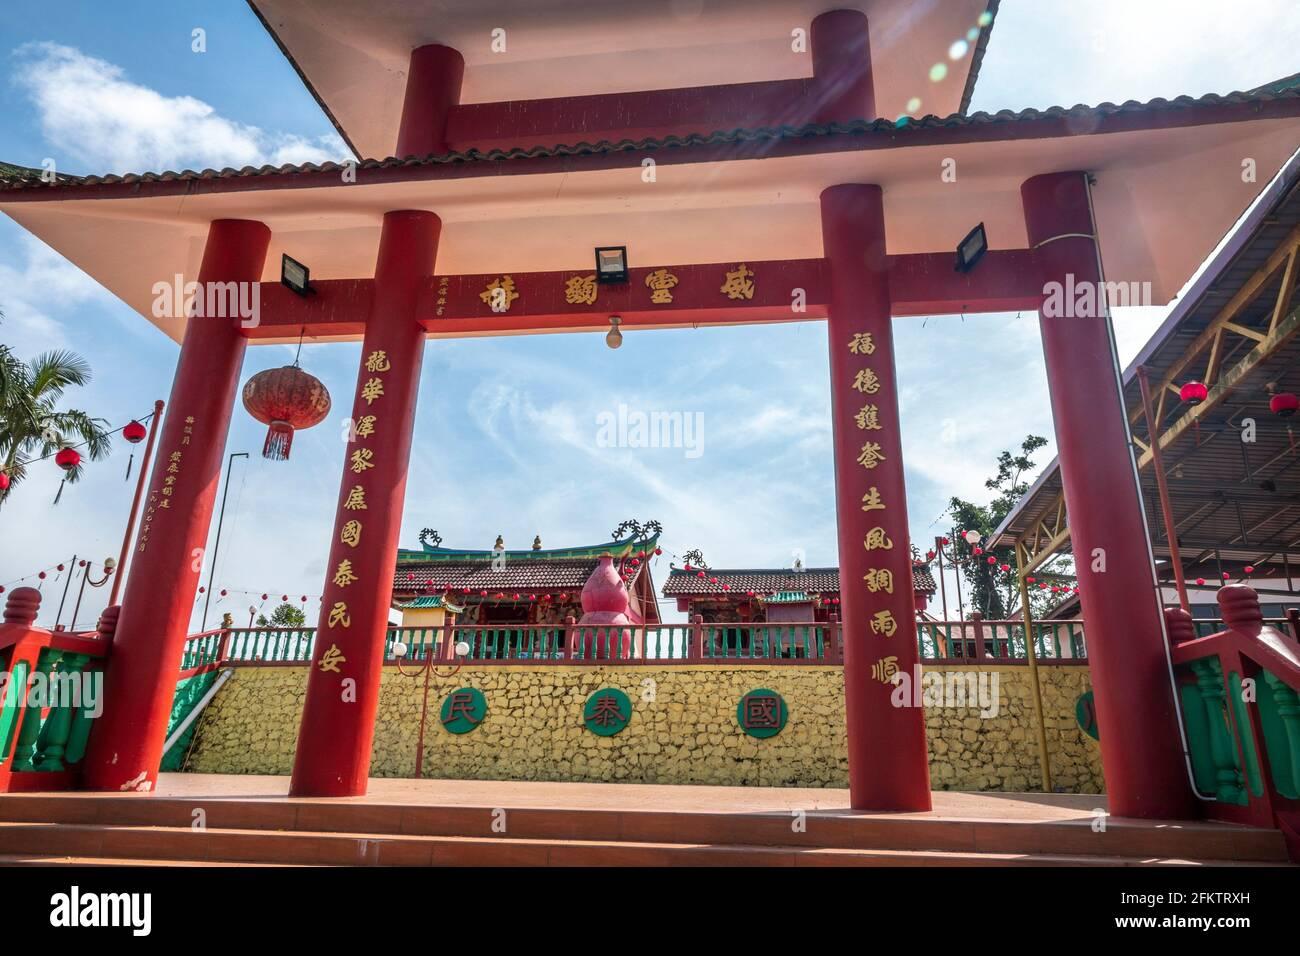 Templo chino, Kampung Musi, Bau, Sarawak, Malasia Oriental Foto de stock